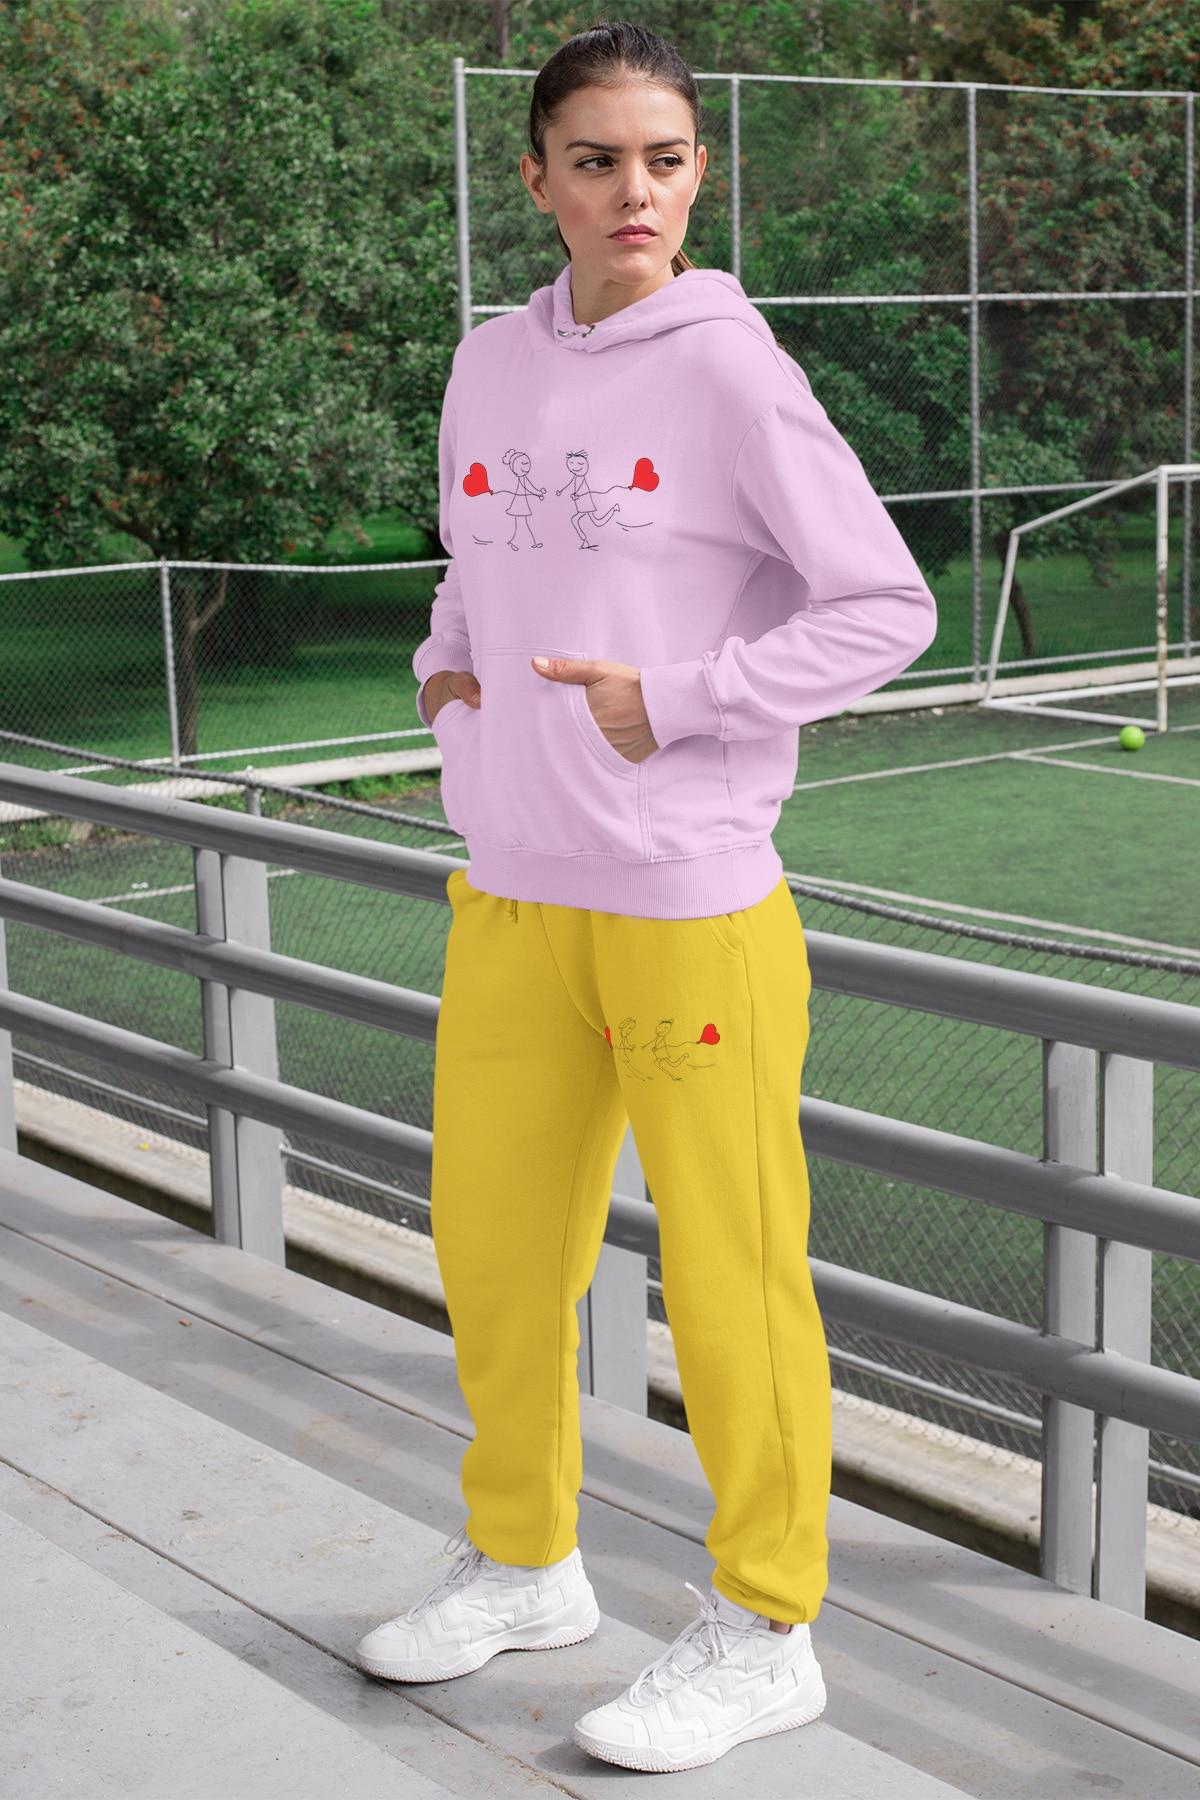 Angemiel wear juntos correndo amantes conjunto de treino feminino rosa com capuz moletom amarelo sweatpants